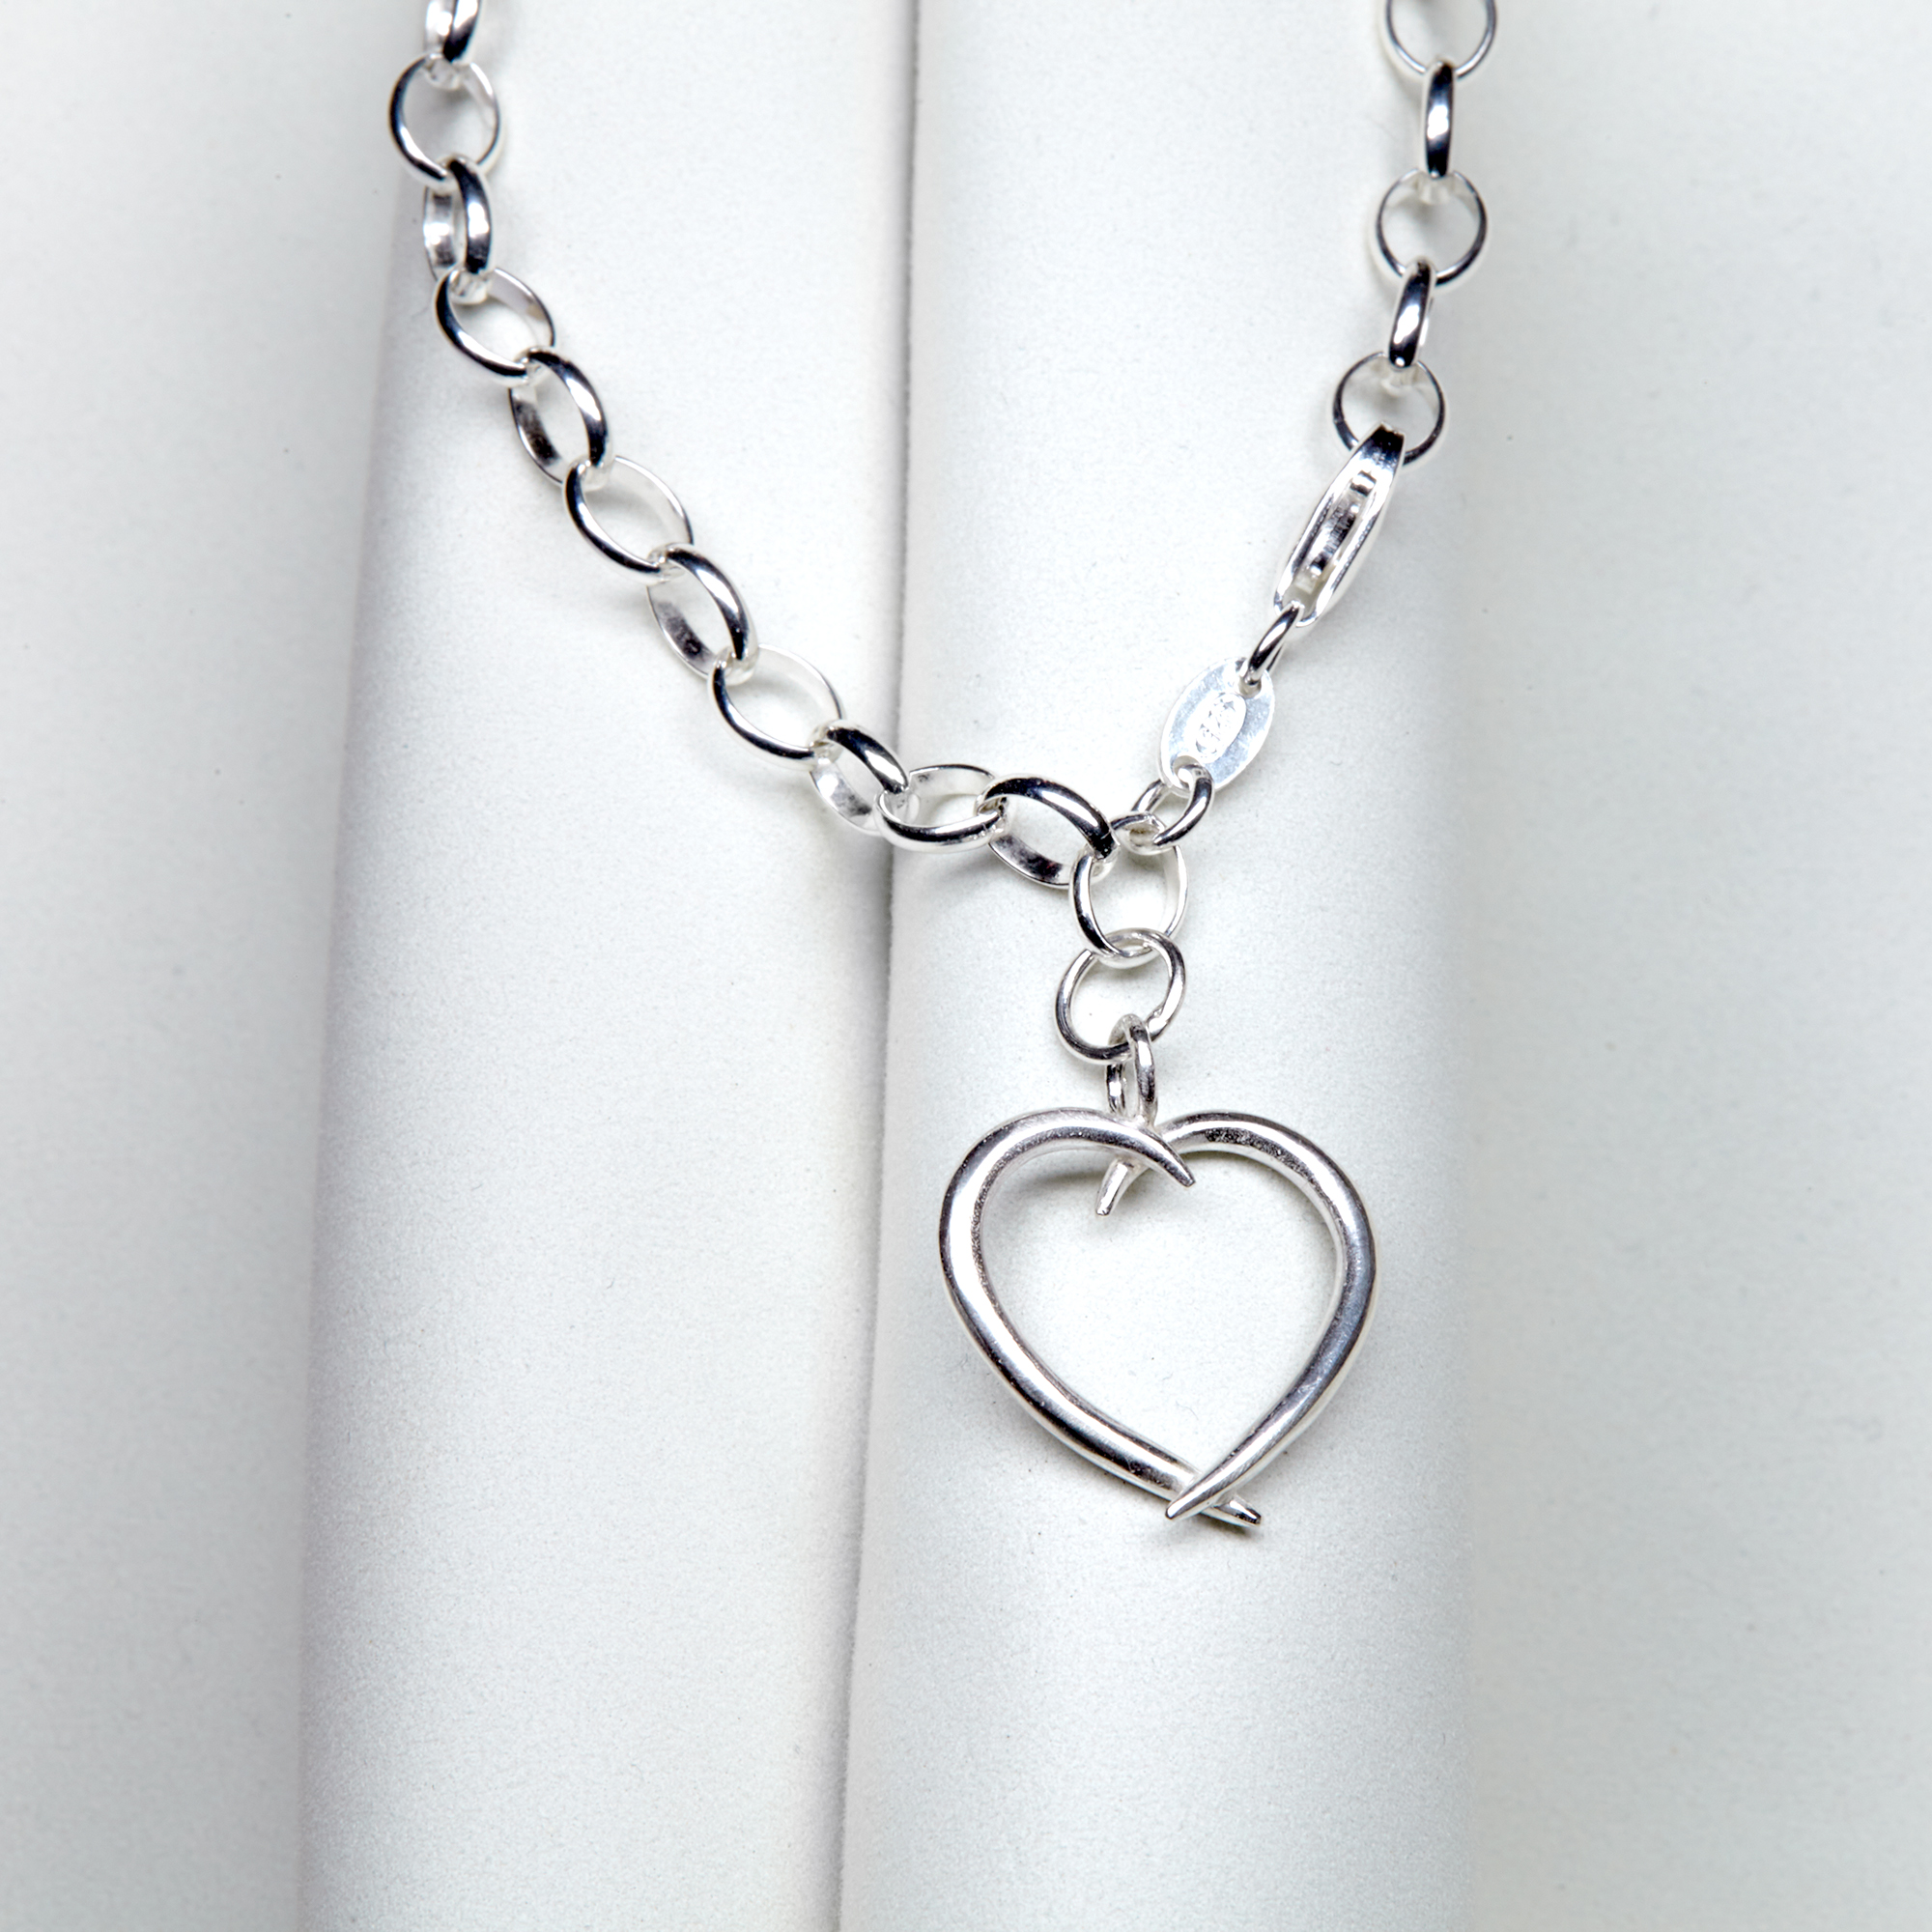 Medium Heart Bracelet